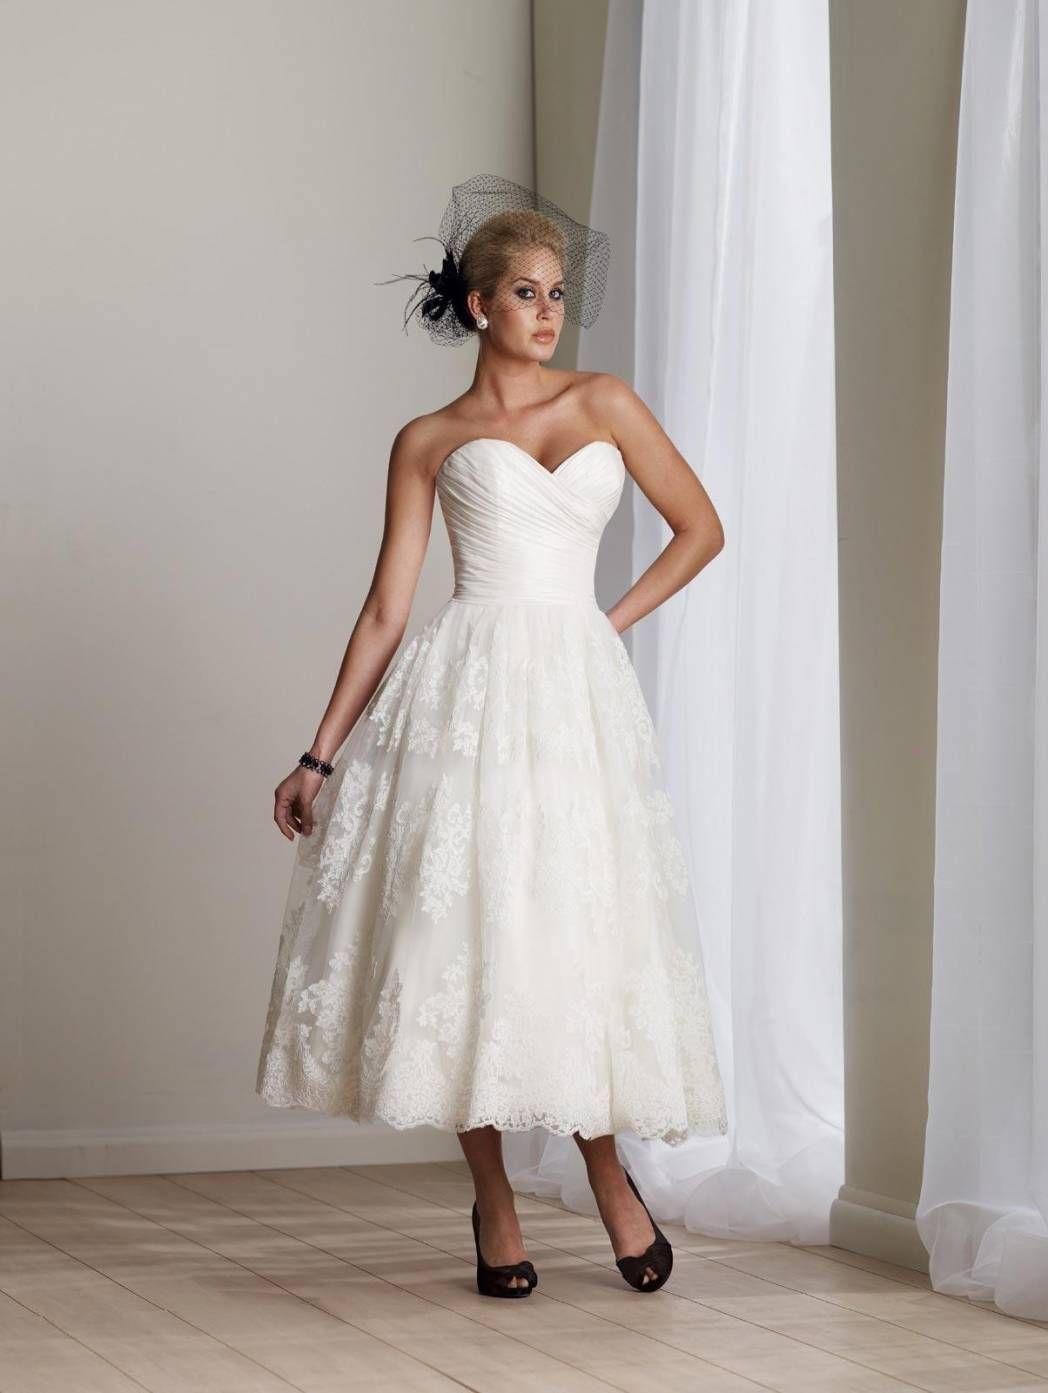 cool short wedding dresses dresses pinterest wedding